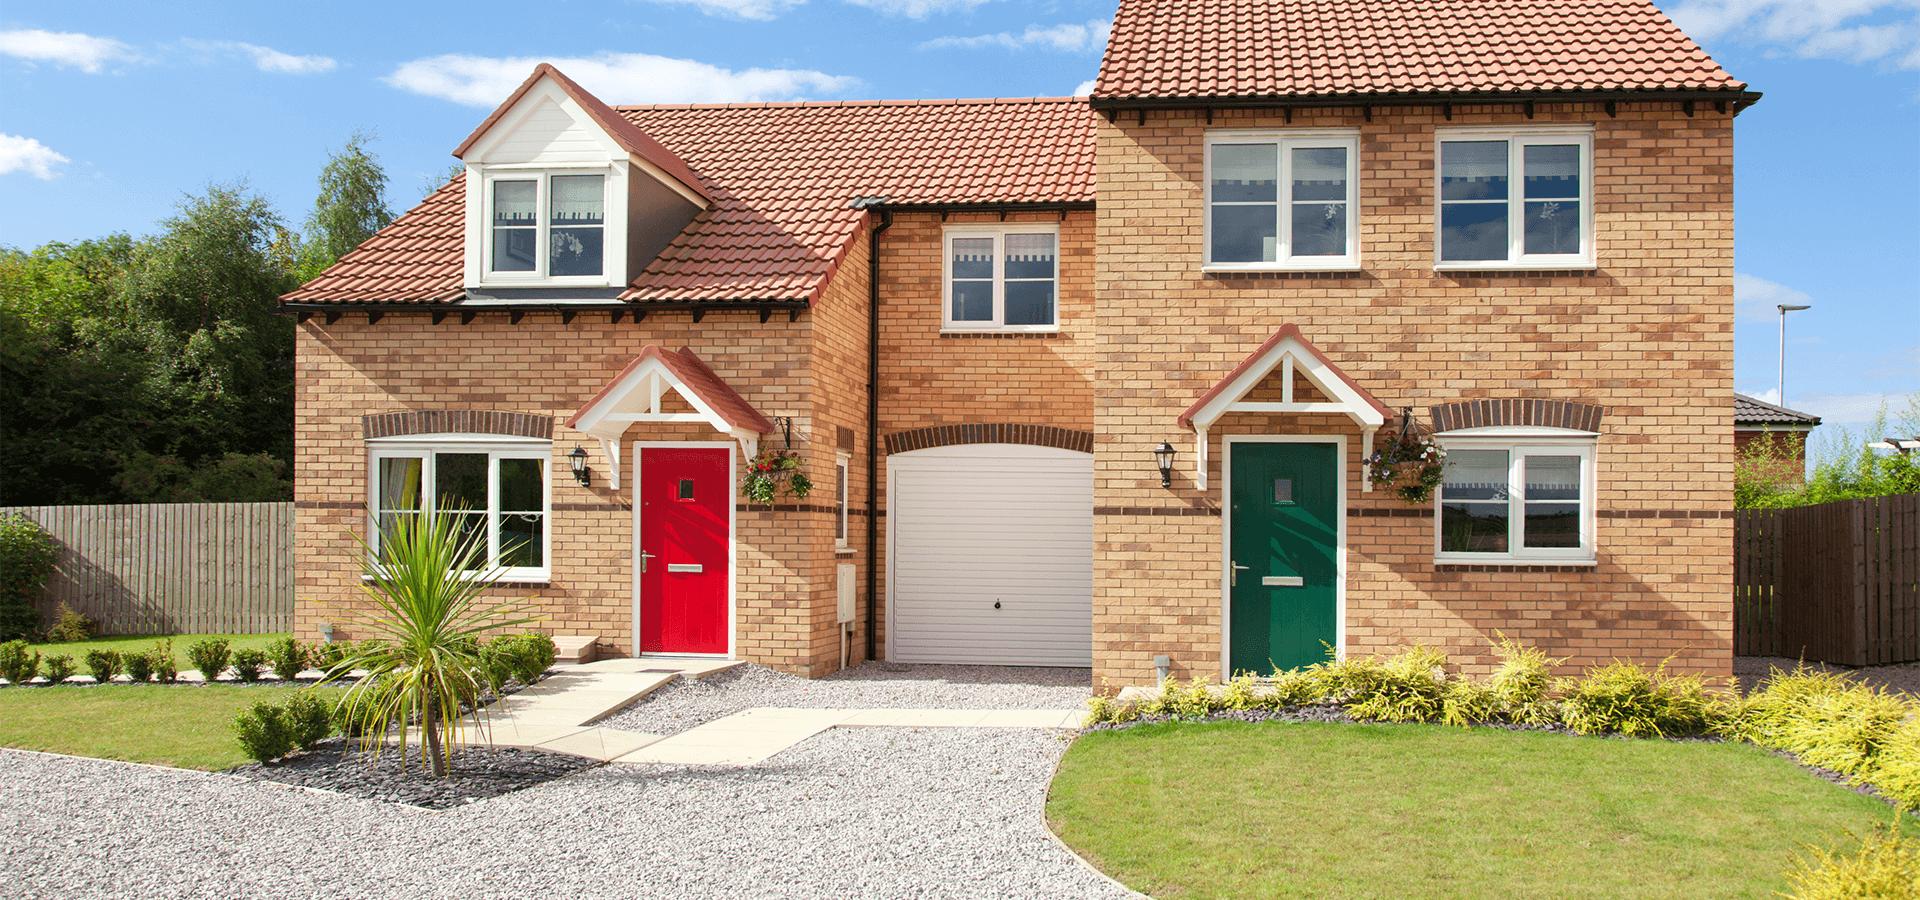 6 ideas for a stunning modern driveway